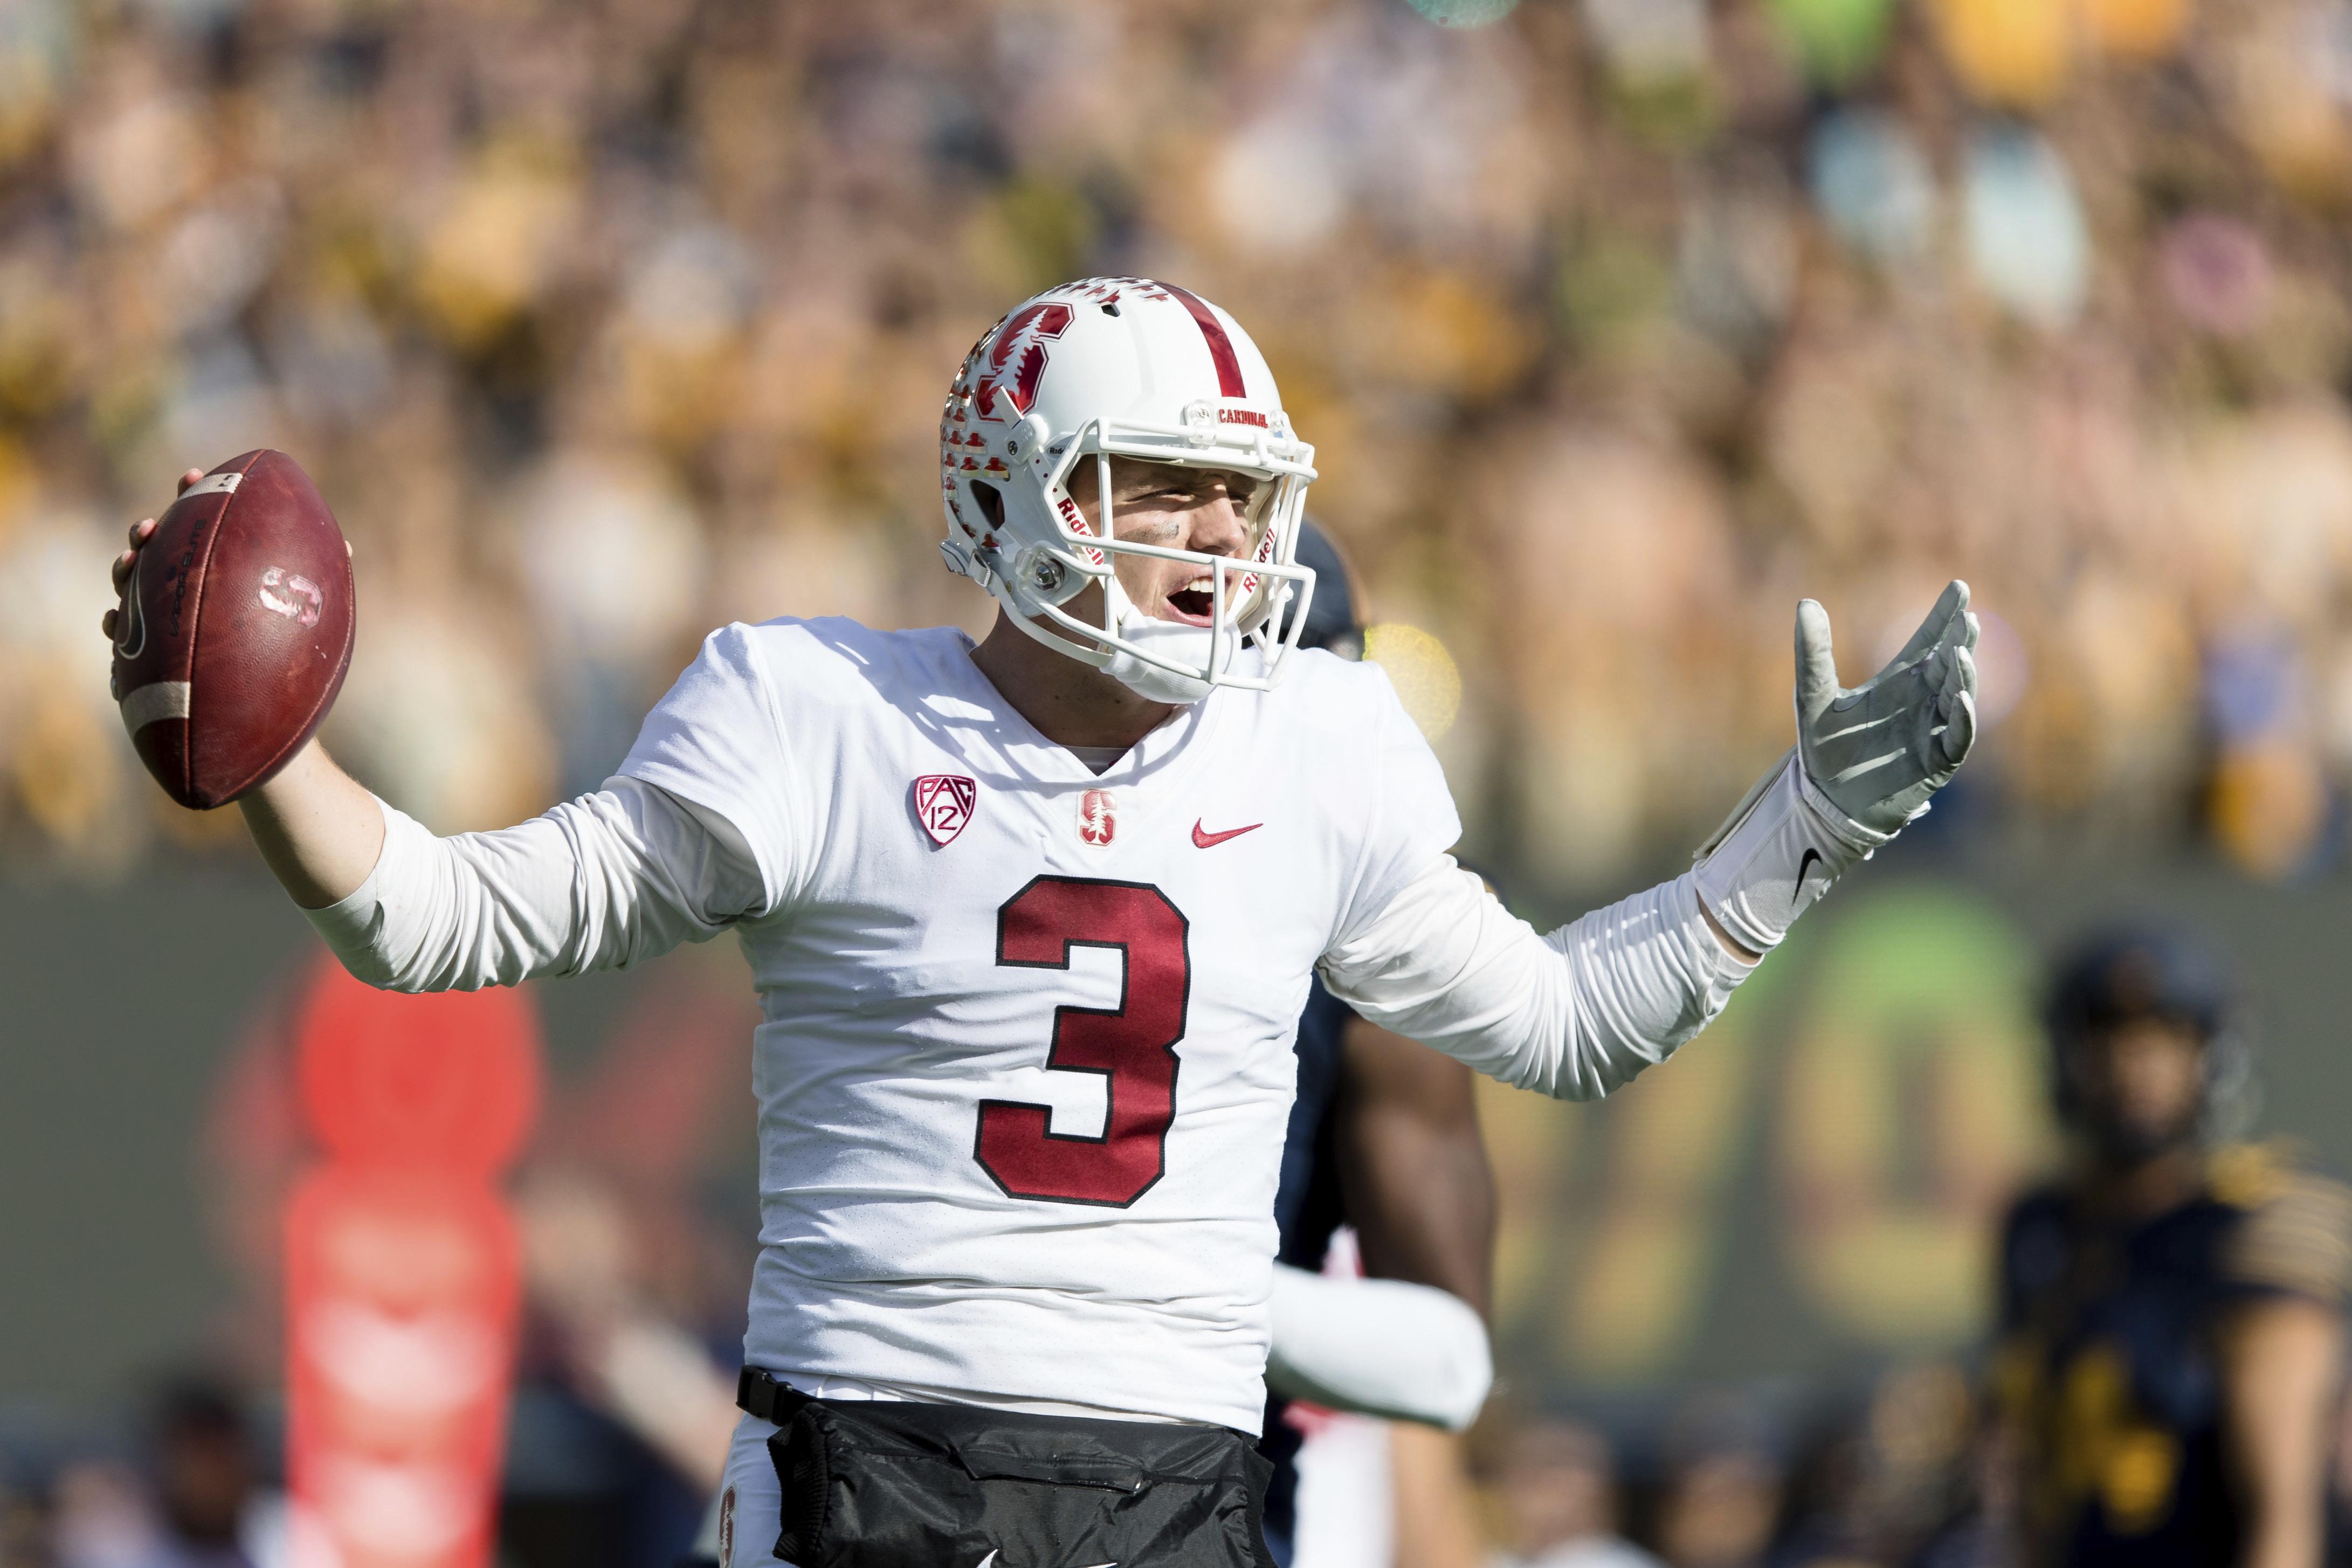 QB K.J. Costello's return provides optimism for Stanford